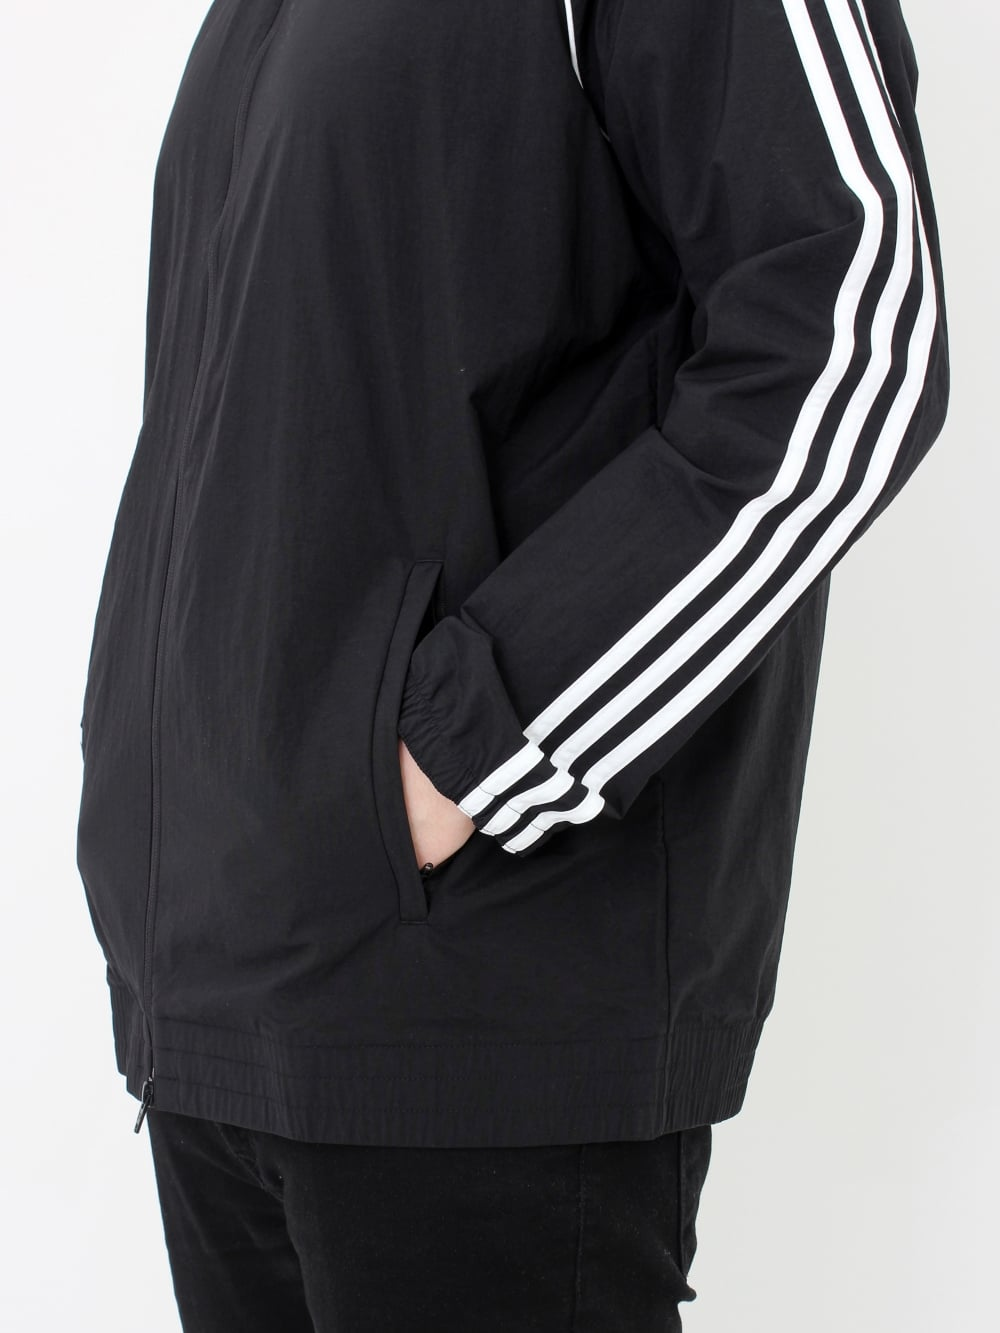 e4aaacd741 adidas Originals SST Windbreaker in Black